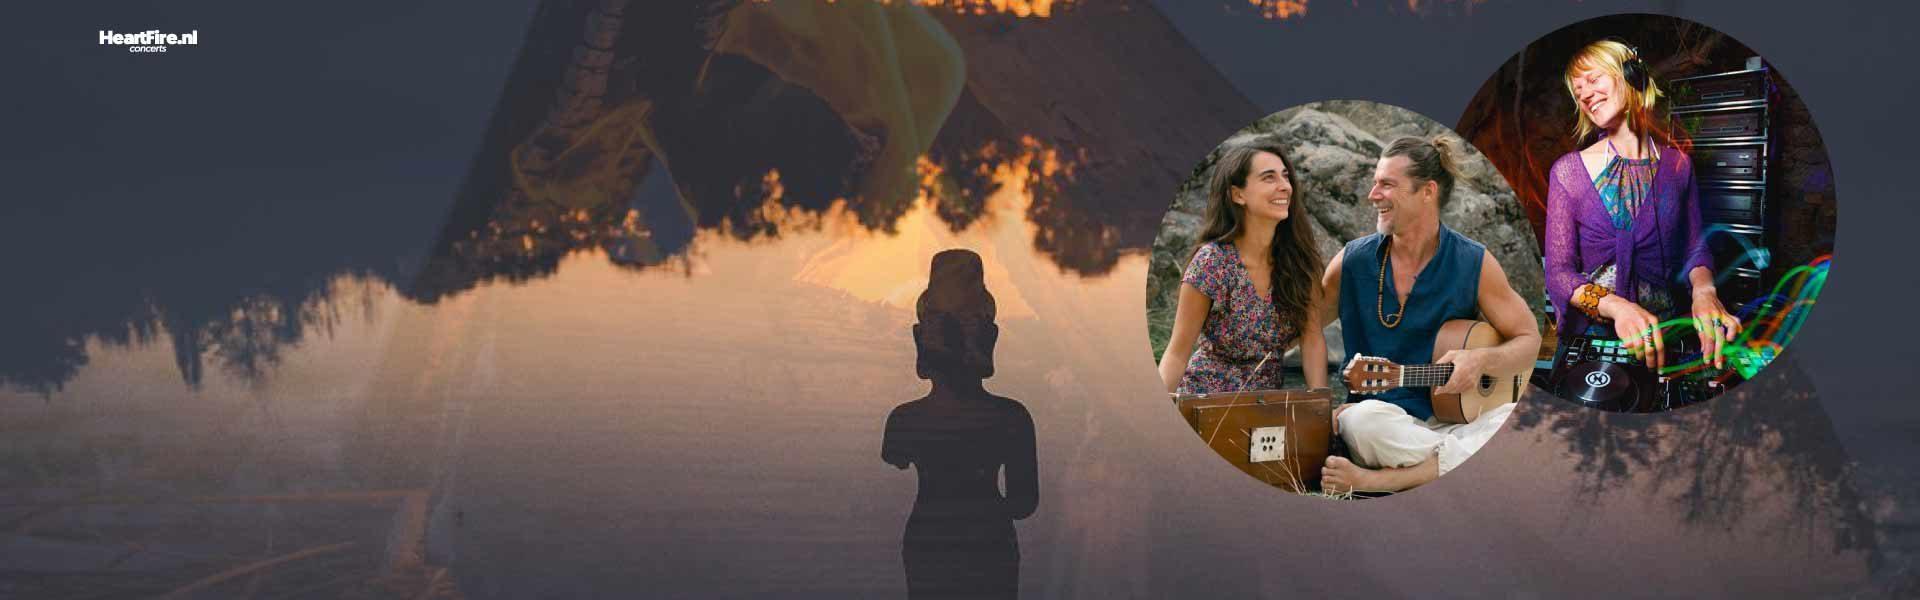 HeartFire CampOut w/Kevin James & Susana + DJ Caroline :: 9 + 10 juni @Landgoed Ottermeerhoeve